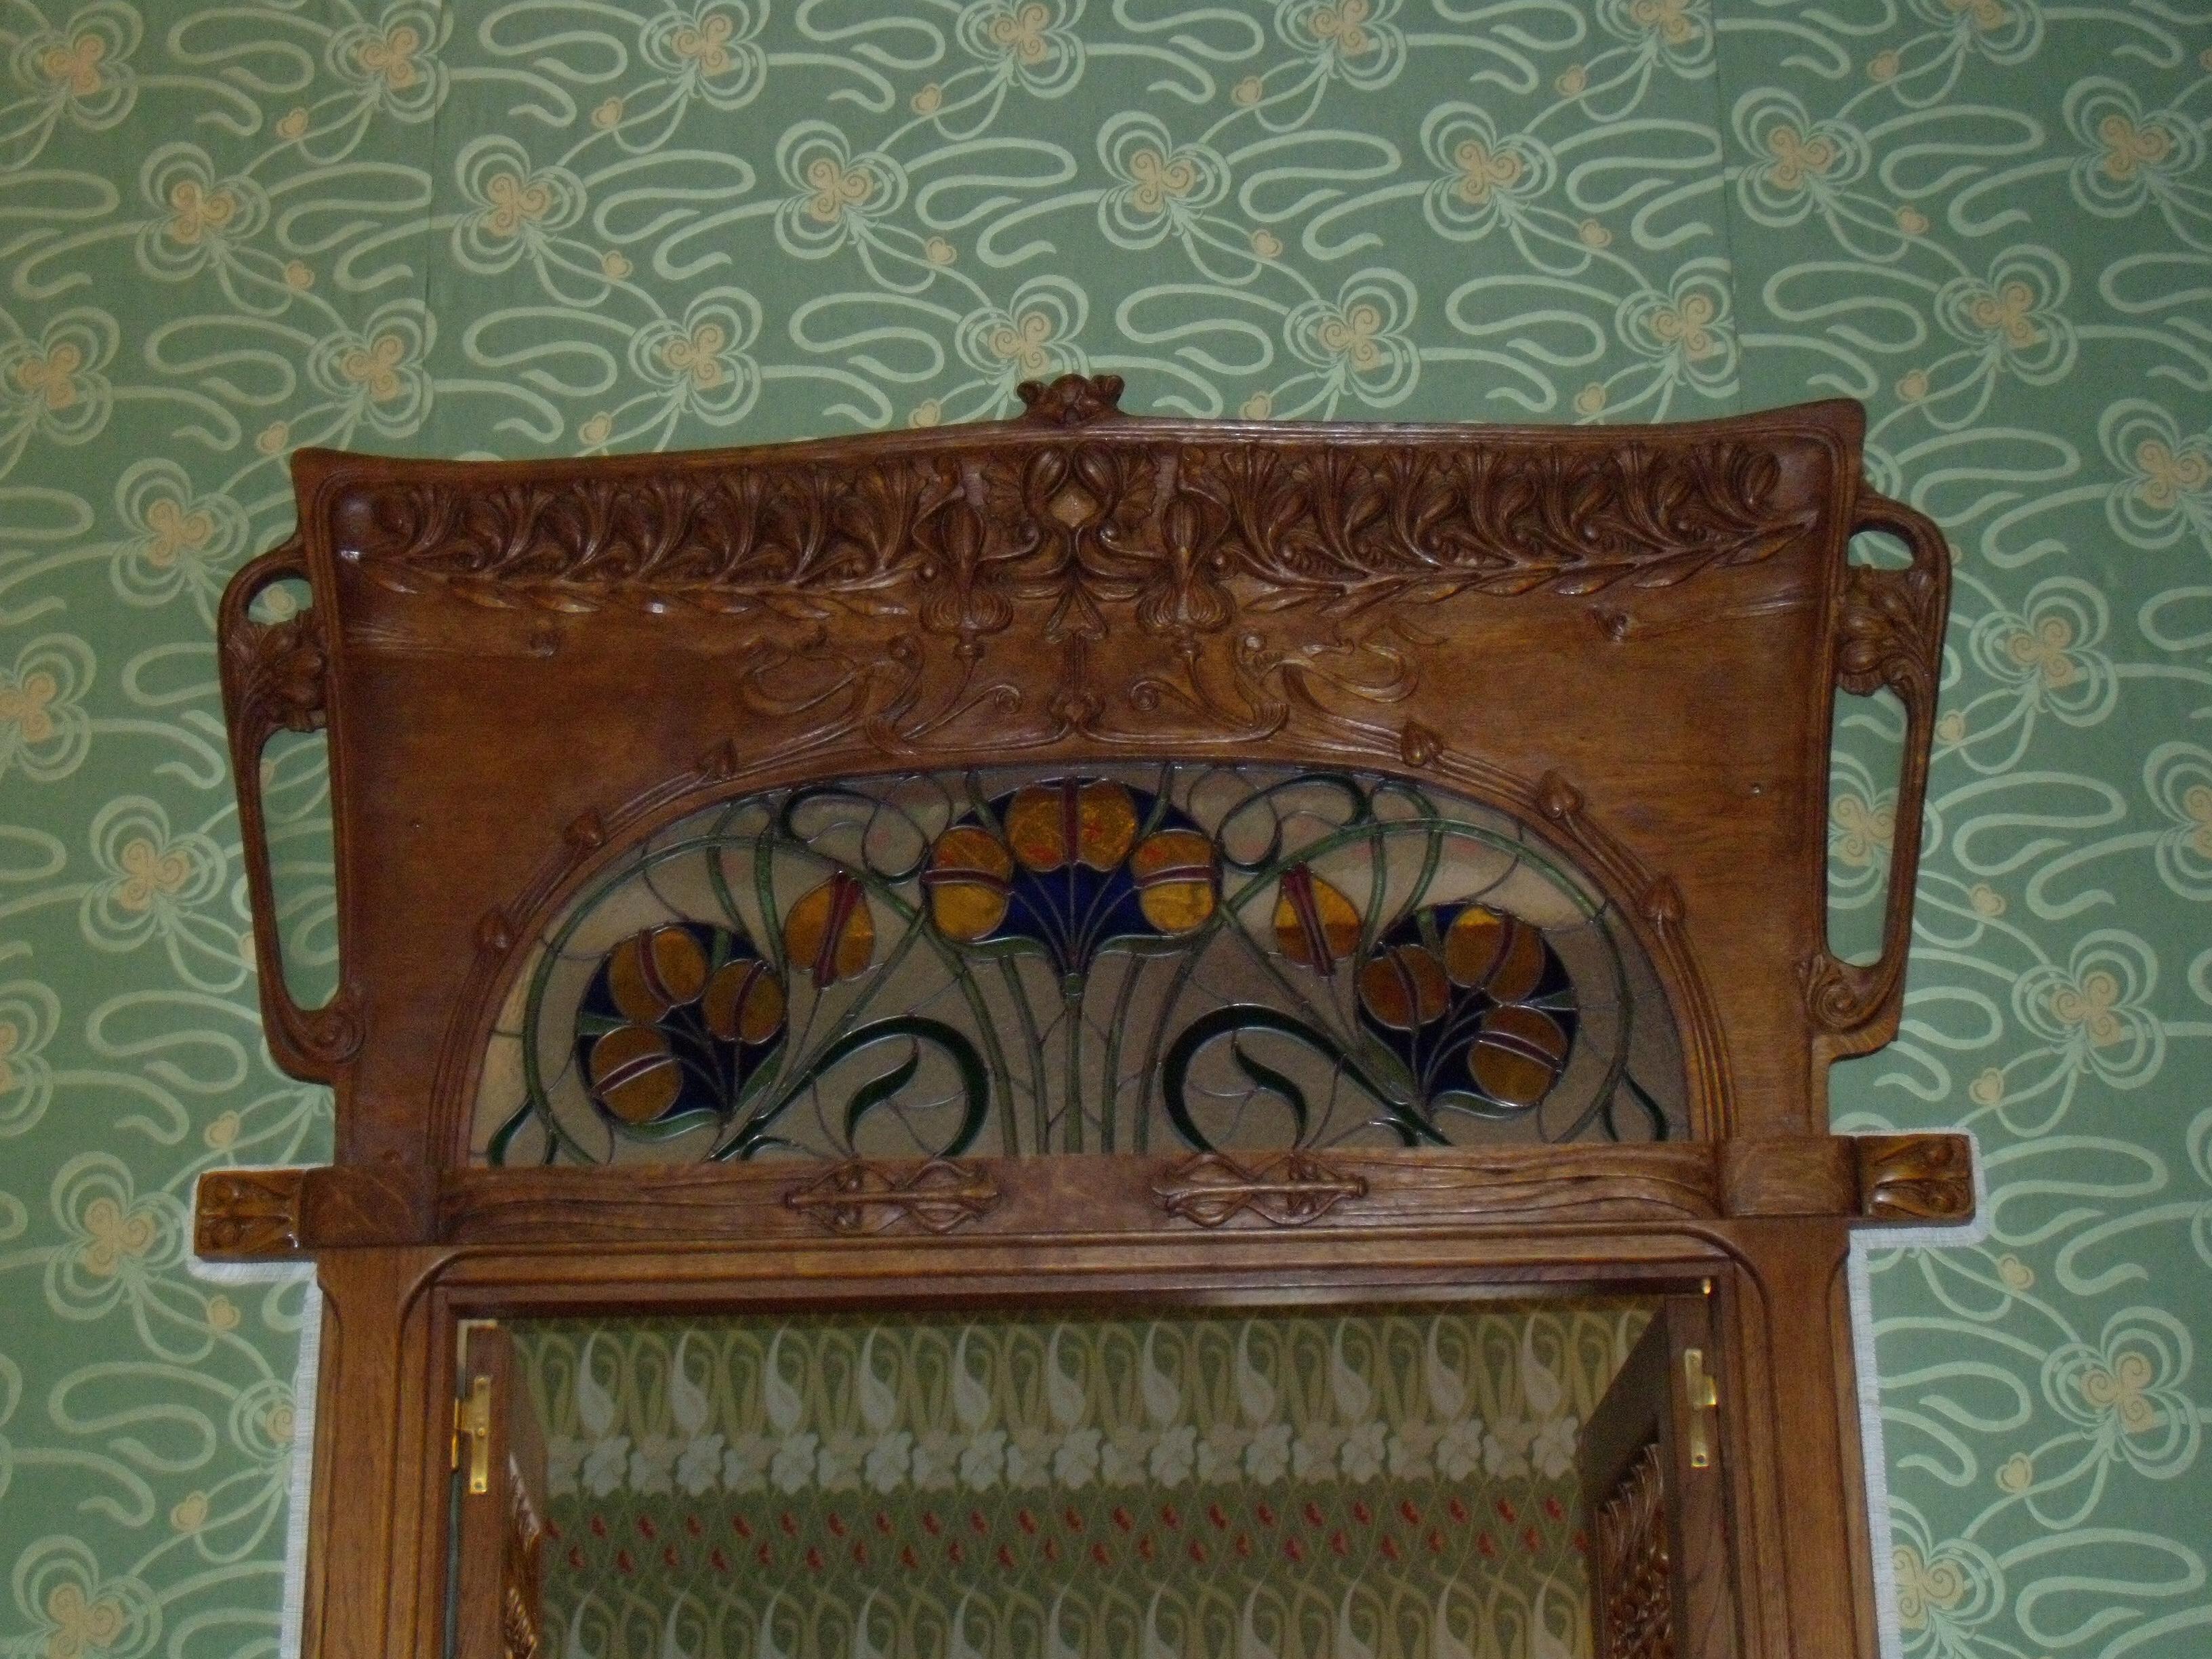 Arredamento stile liberty antico specchio stile liberty - Art nouveau mobili ...